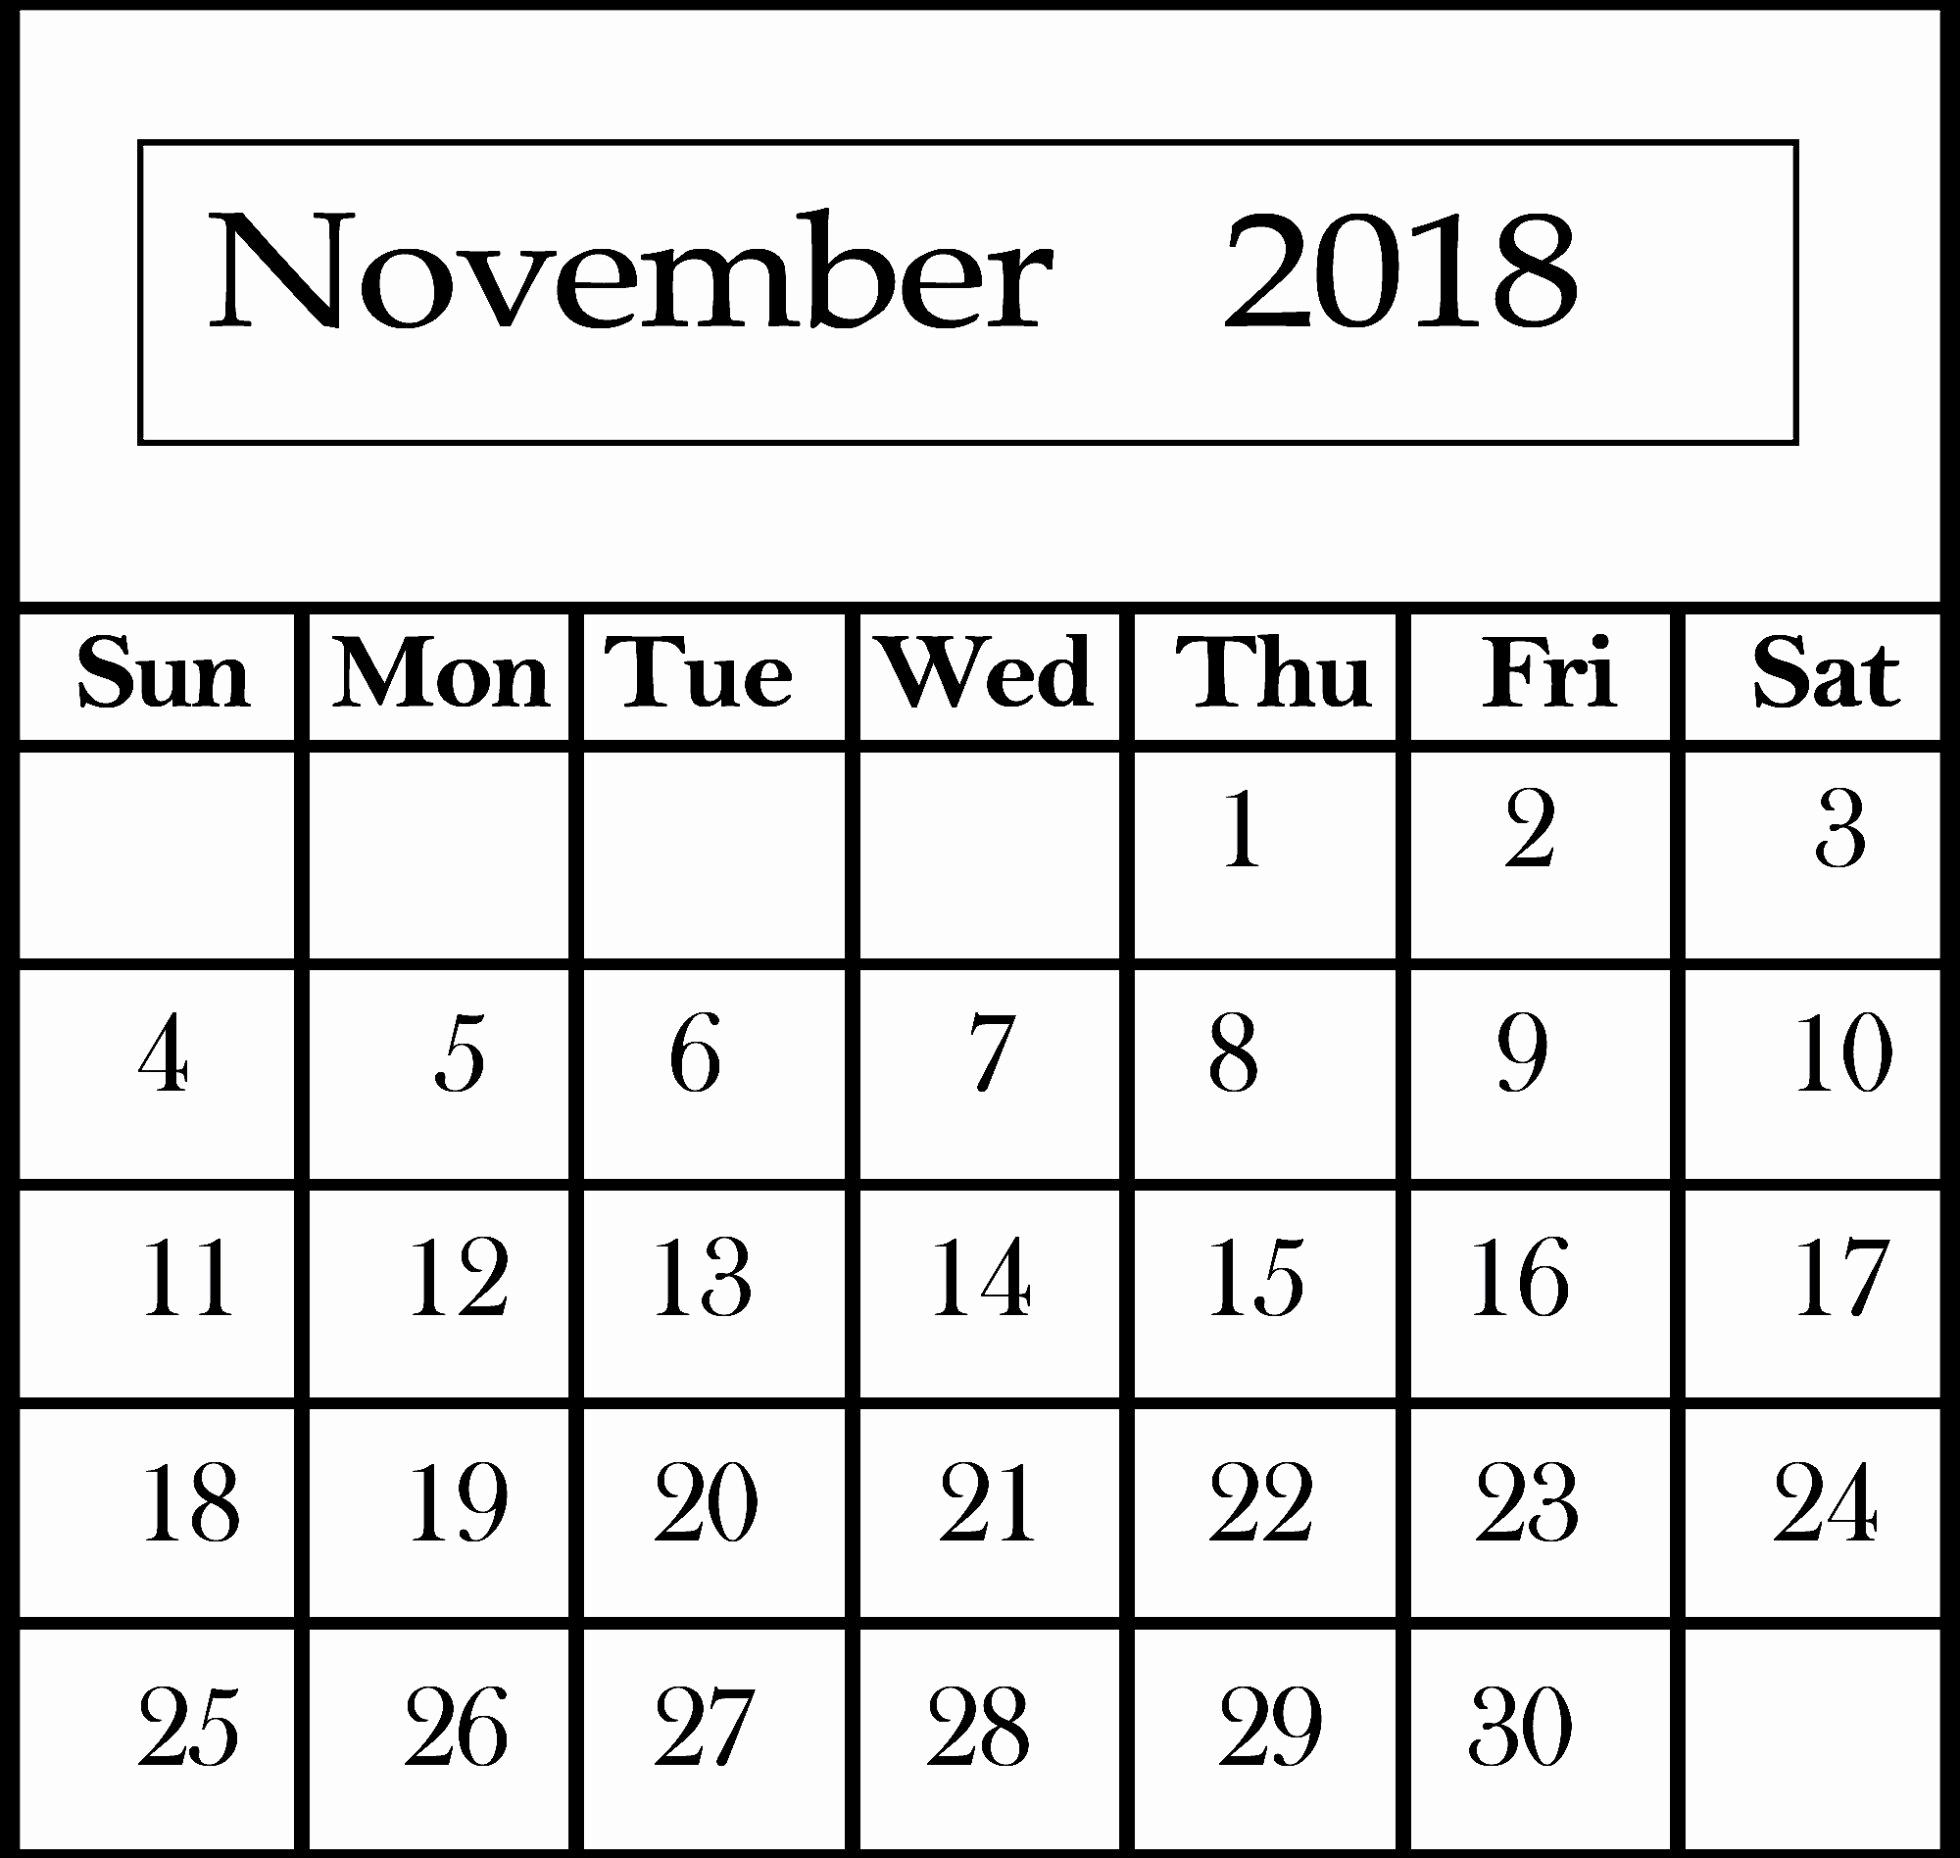 november 2018 calendar cute november 2018 calendar cute calendar::November 2018 Calendar Pdf